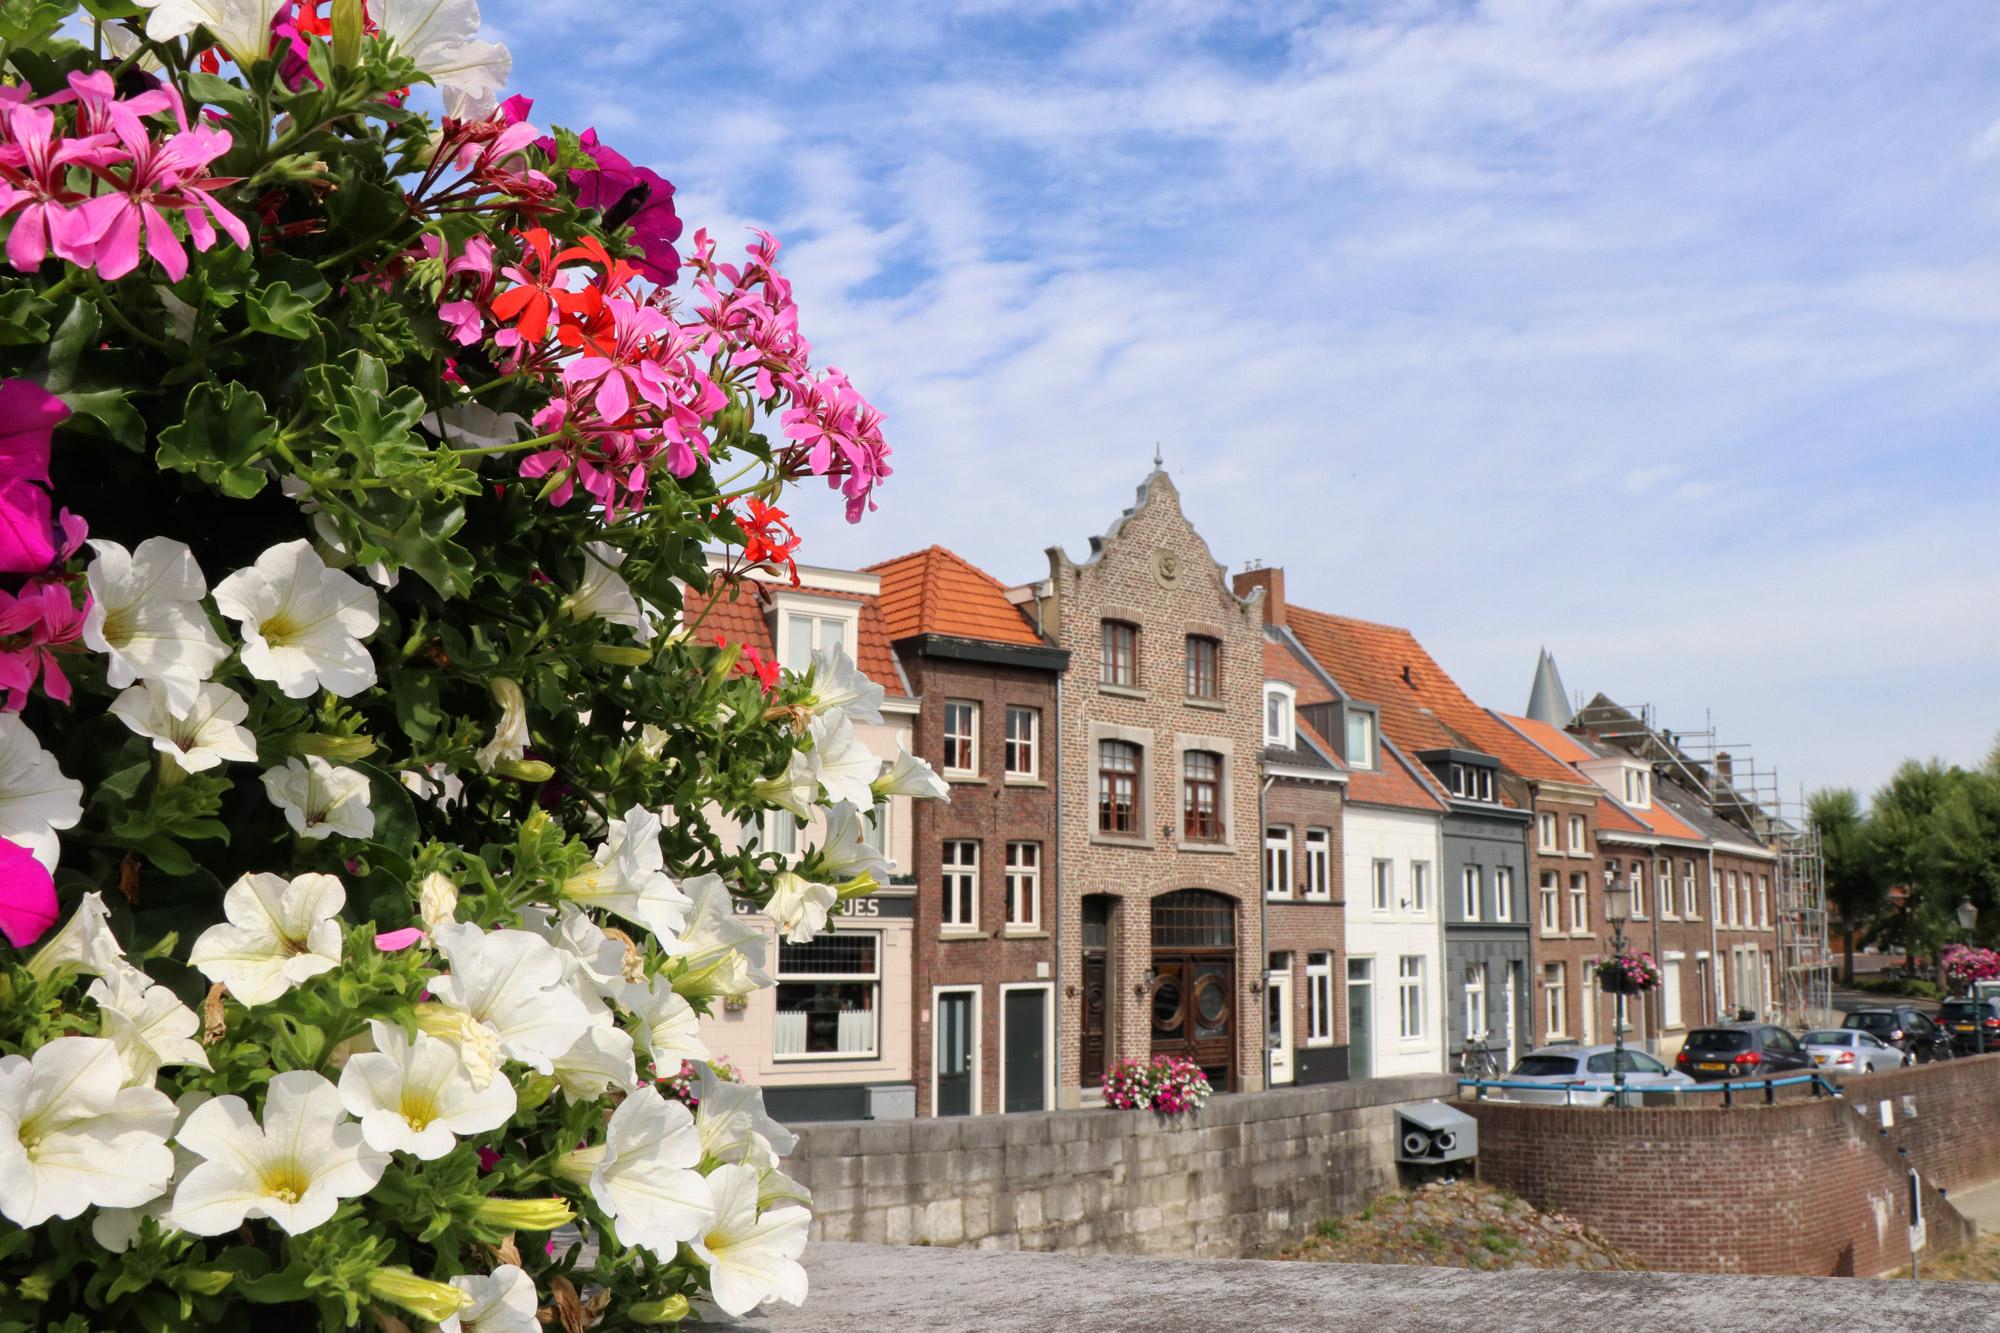 Roermond - Voorstad St. Jacob